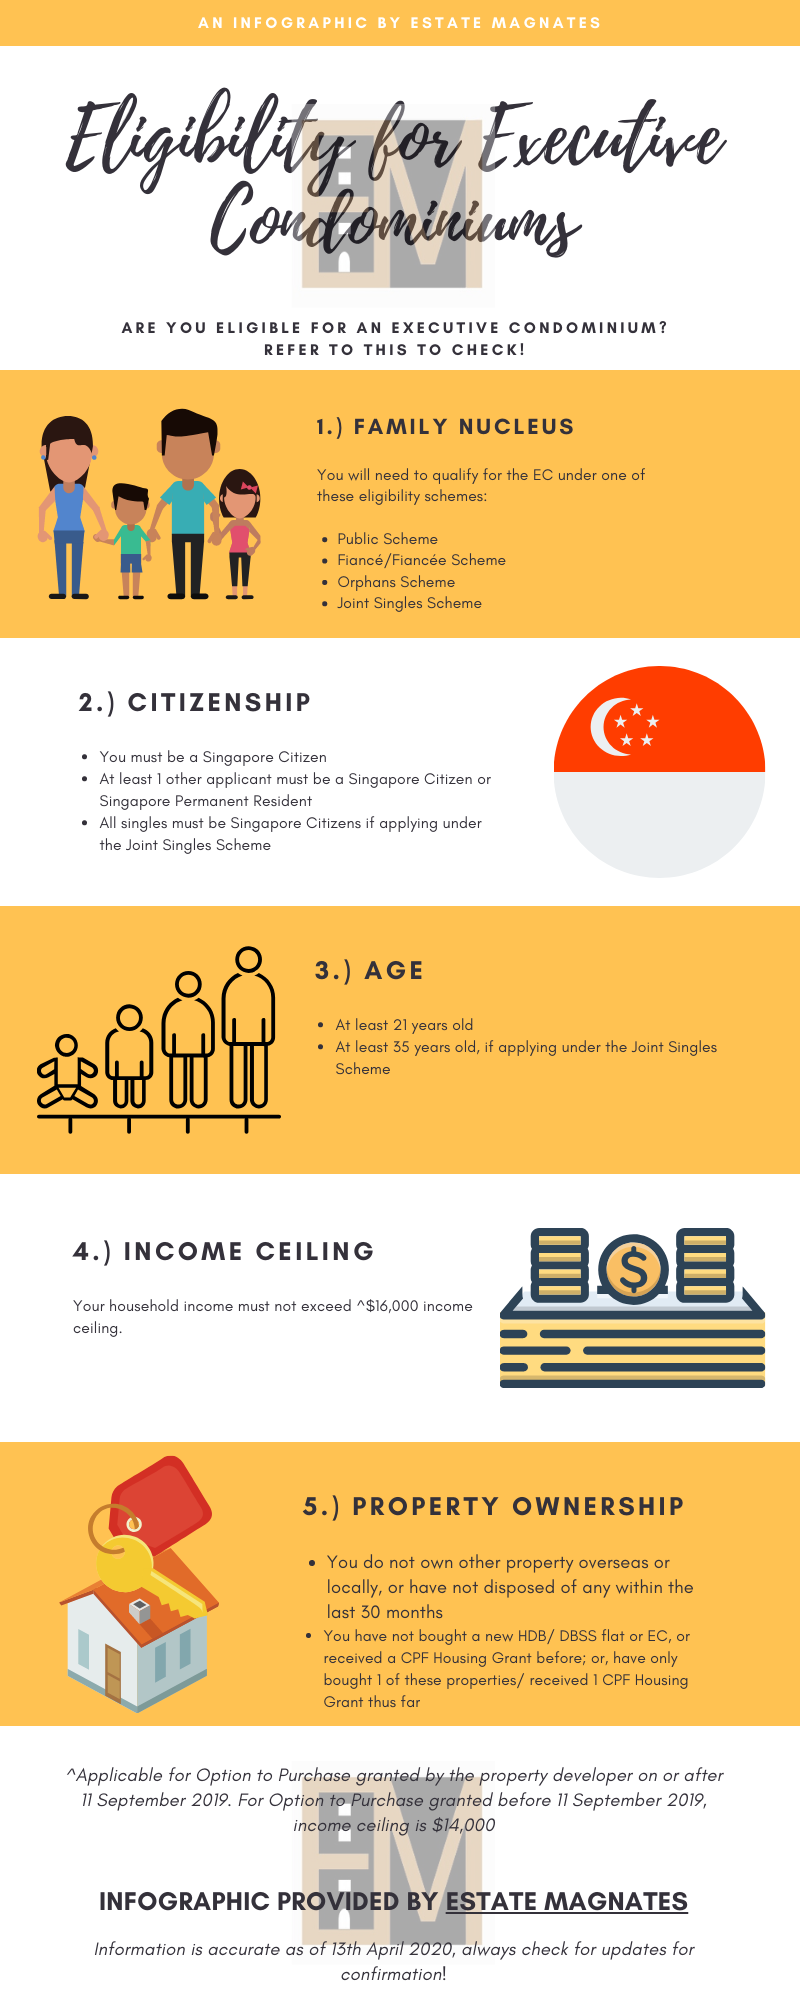 Elgibility for Executive Condominiums in Singapore